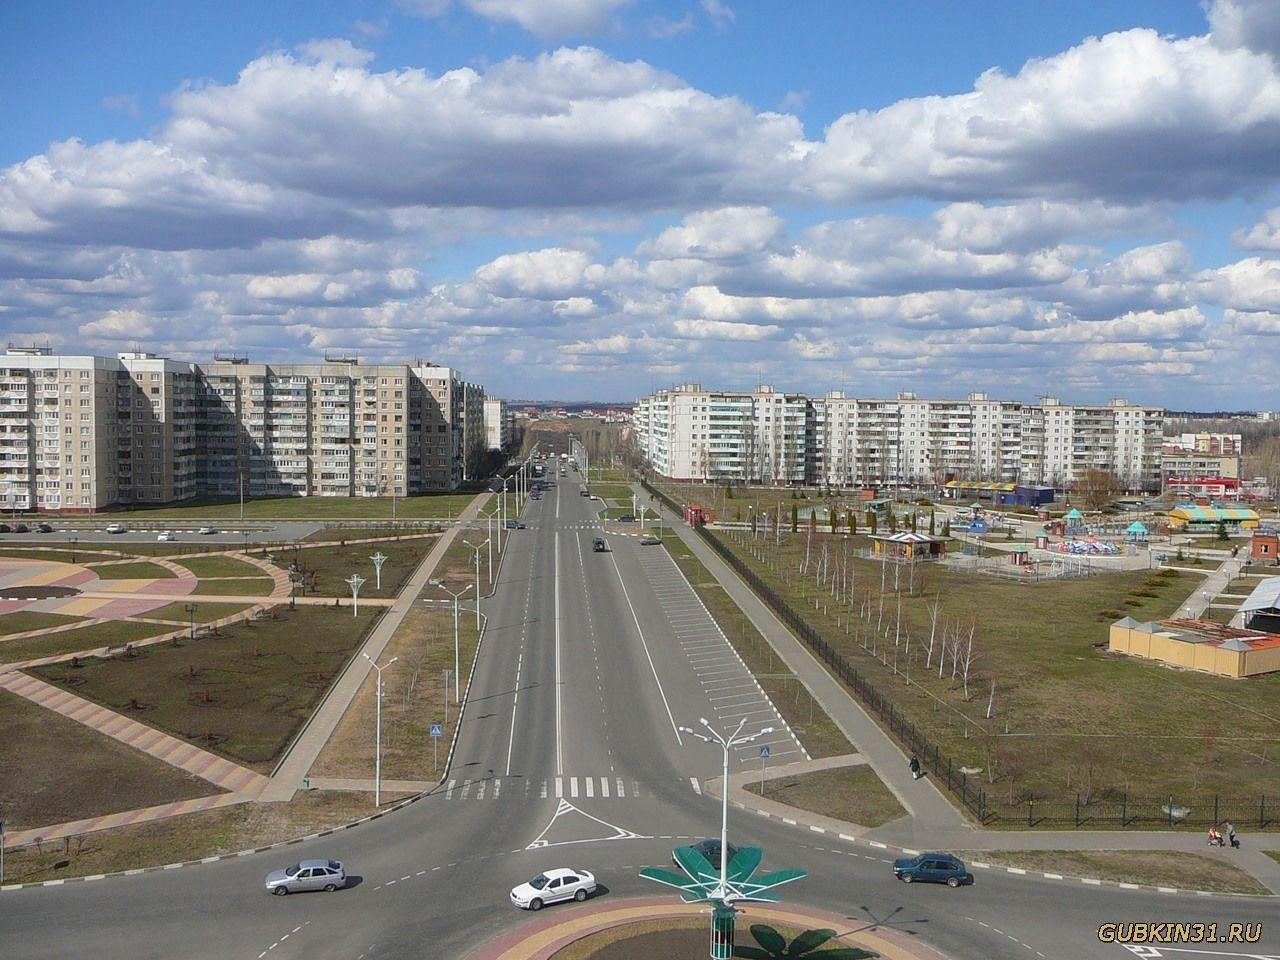 Картинки губкина белгородской области